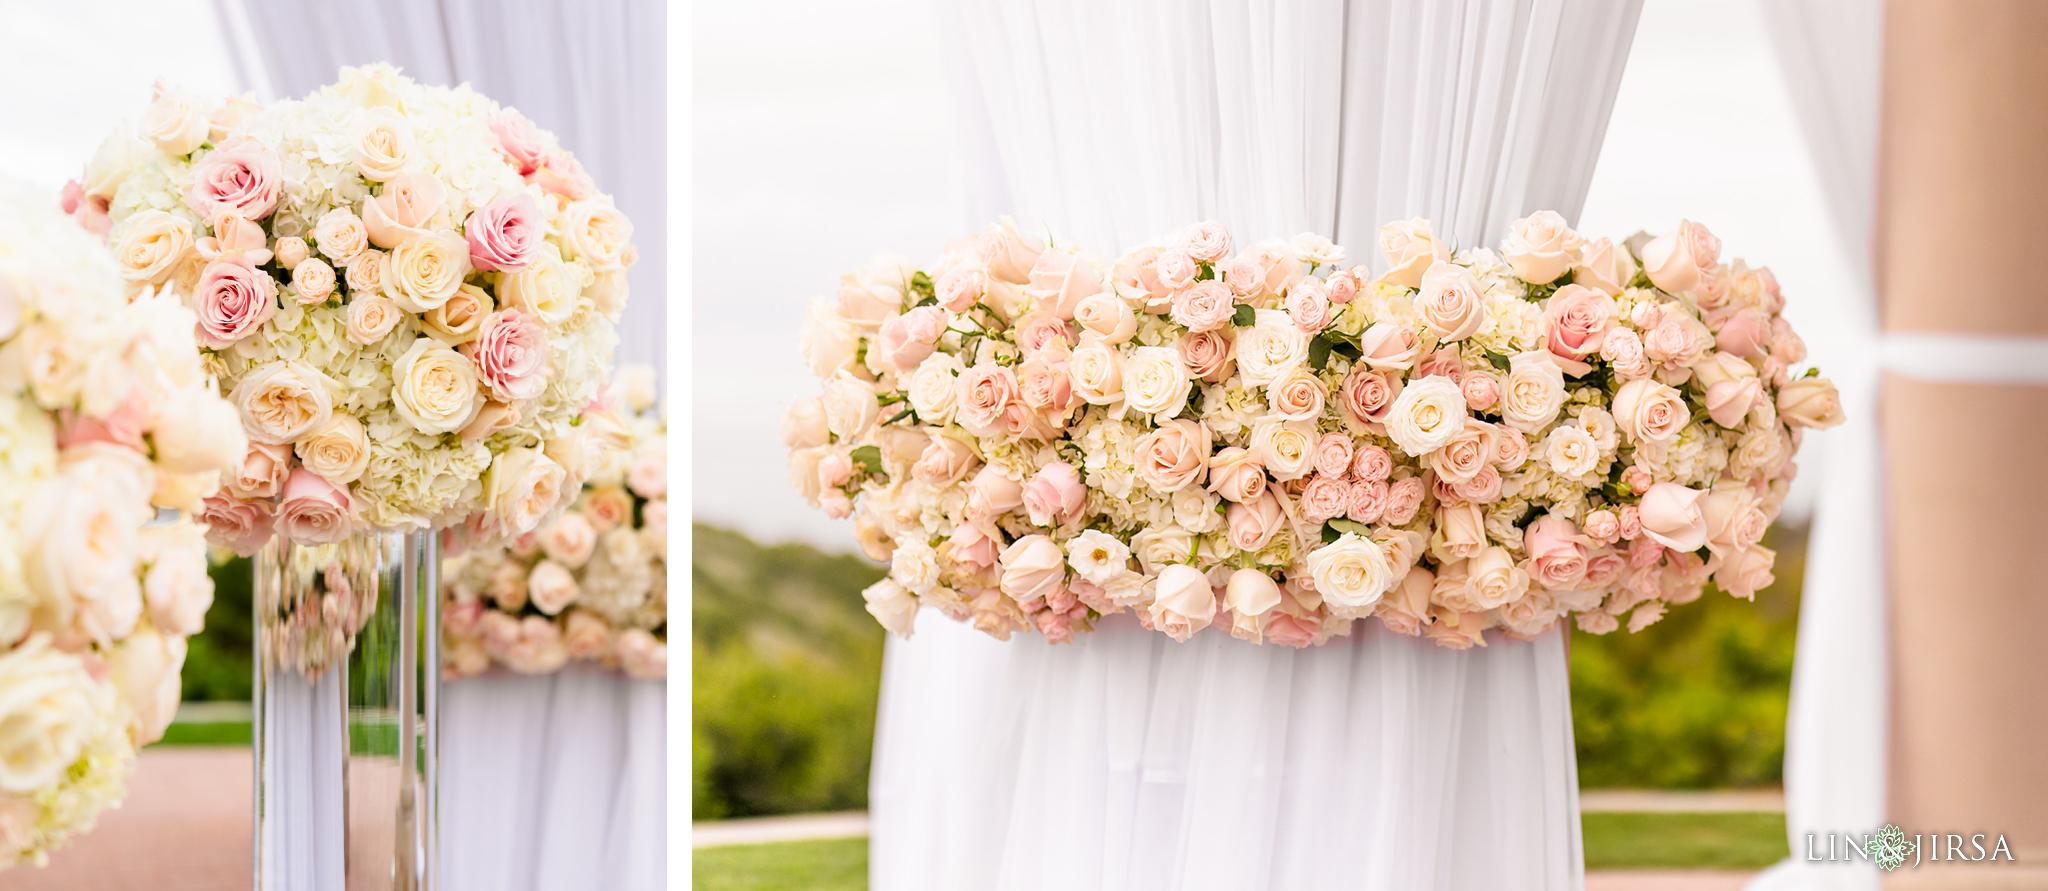 10 Pelican Hill Resort Orange County Wedding Photographer